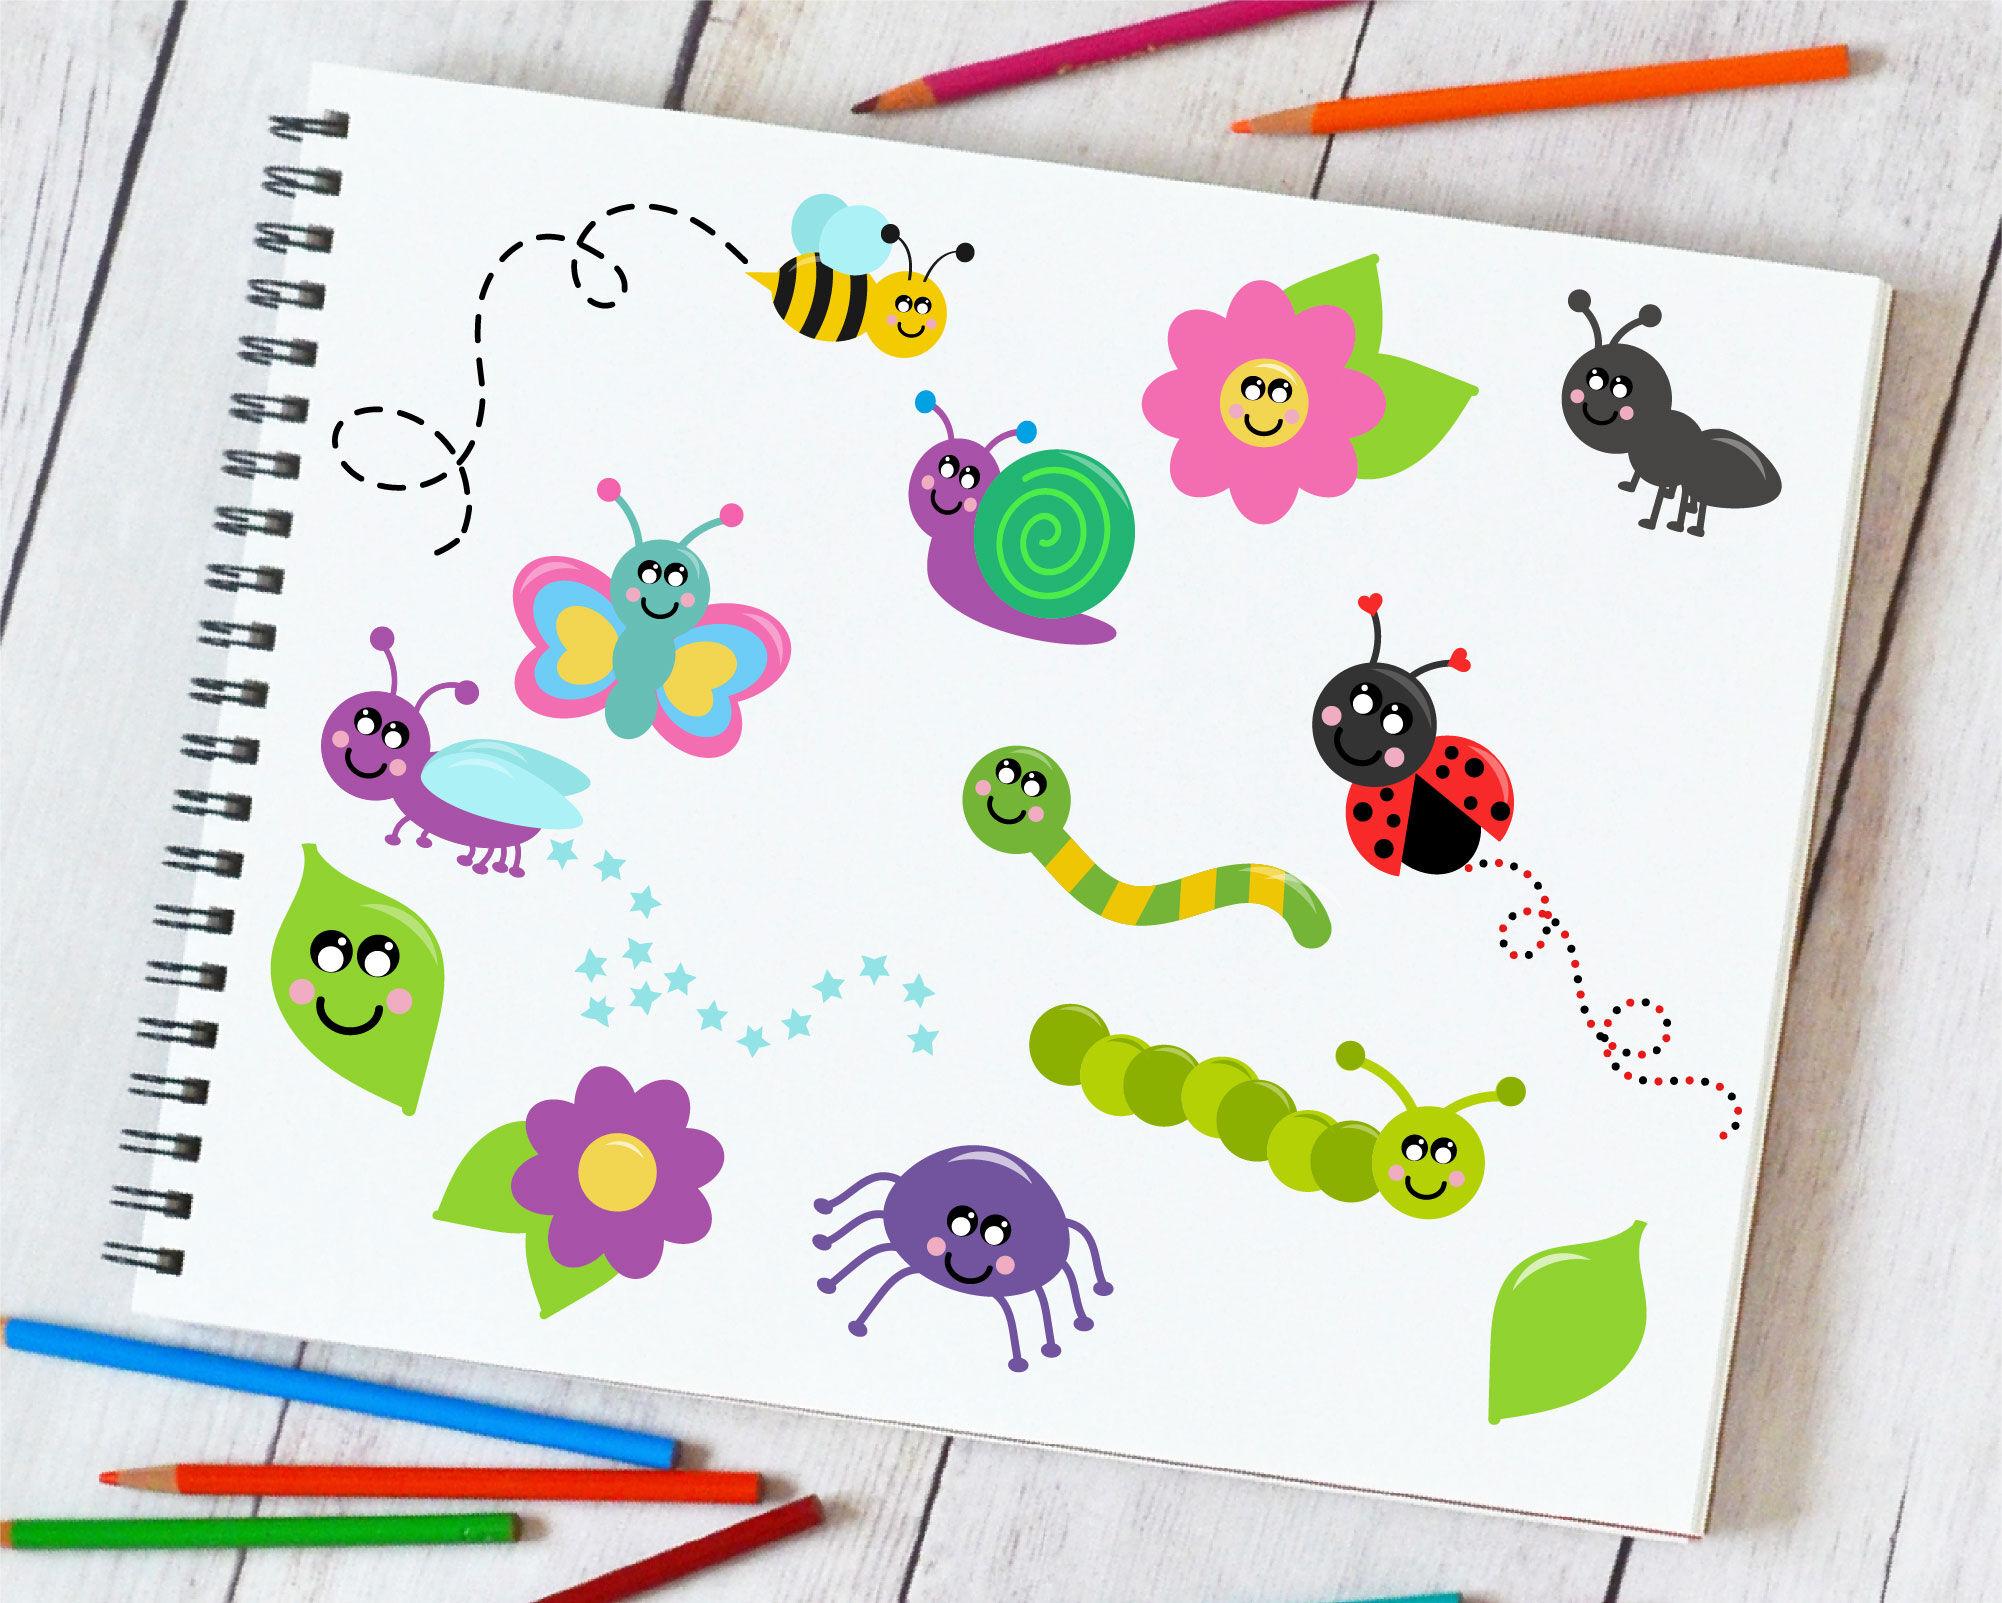 Bugs Clipart Ladybug Clip Art Butterfly Digital Art By Crafty